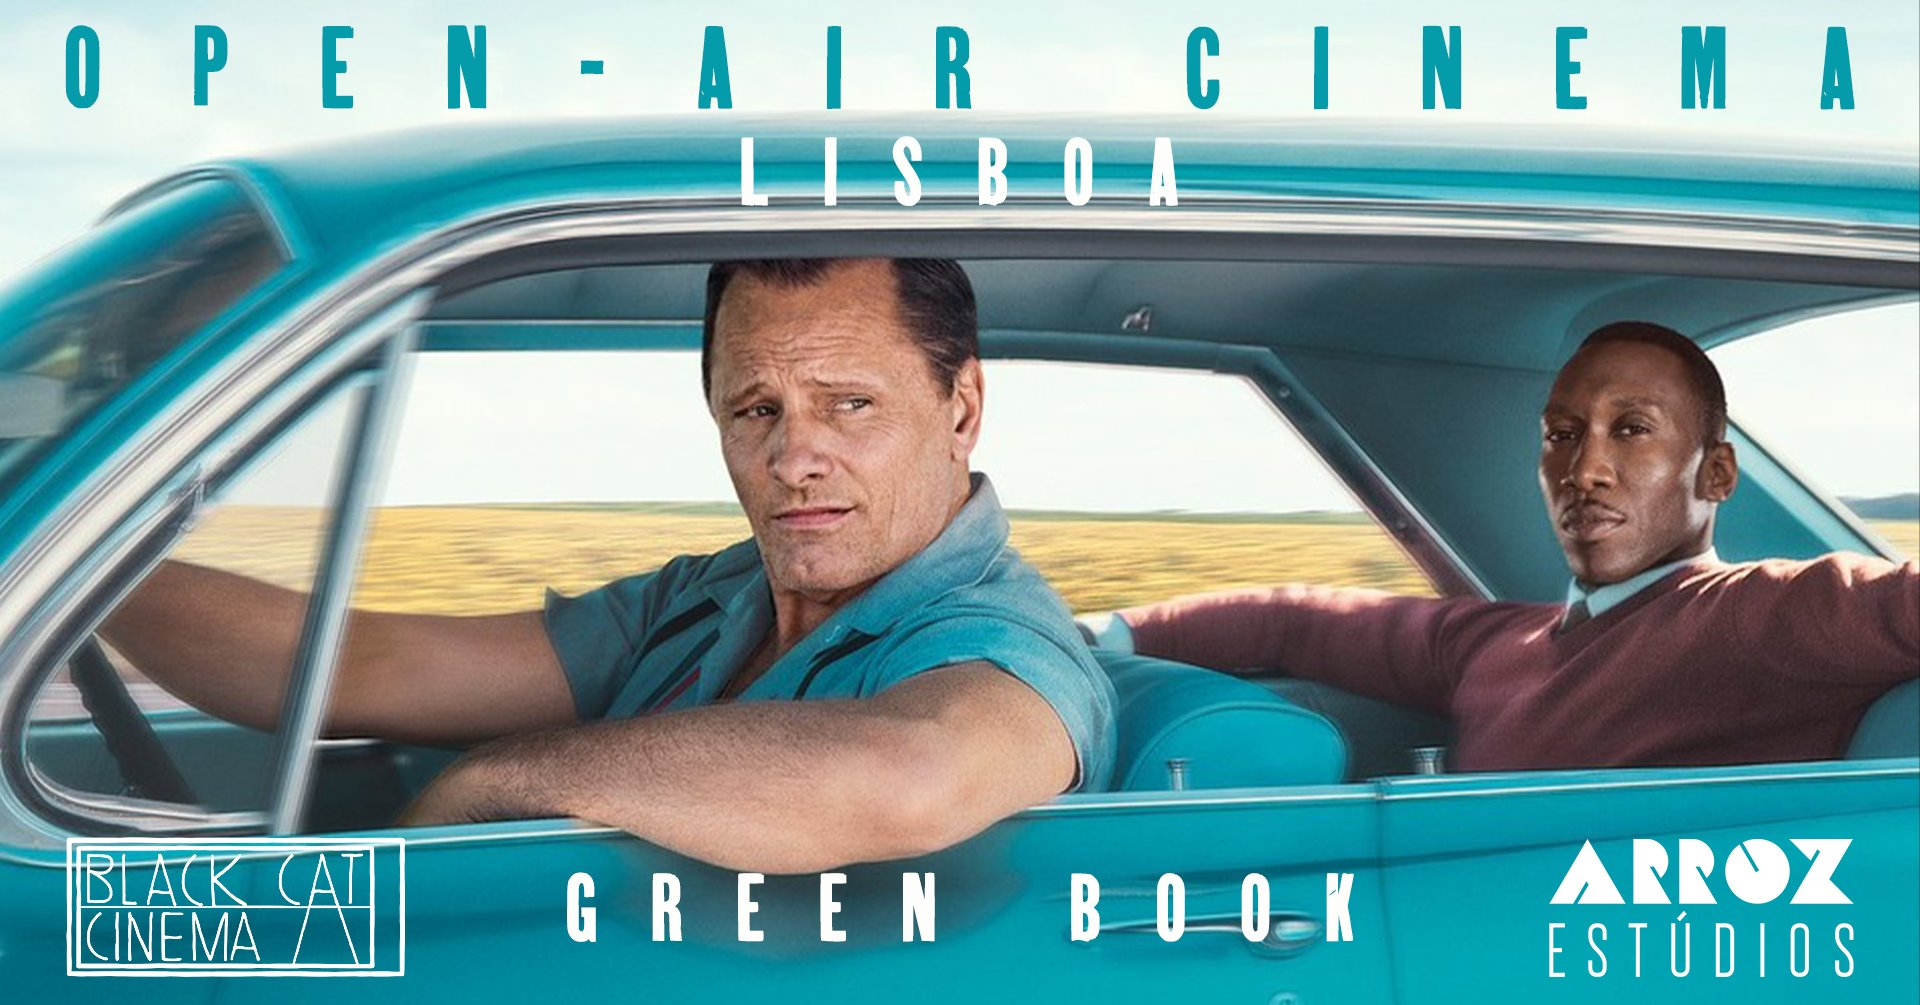 Open-air cinema: Green Book